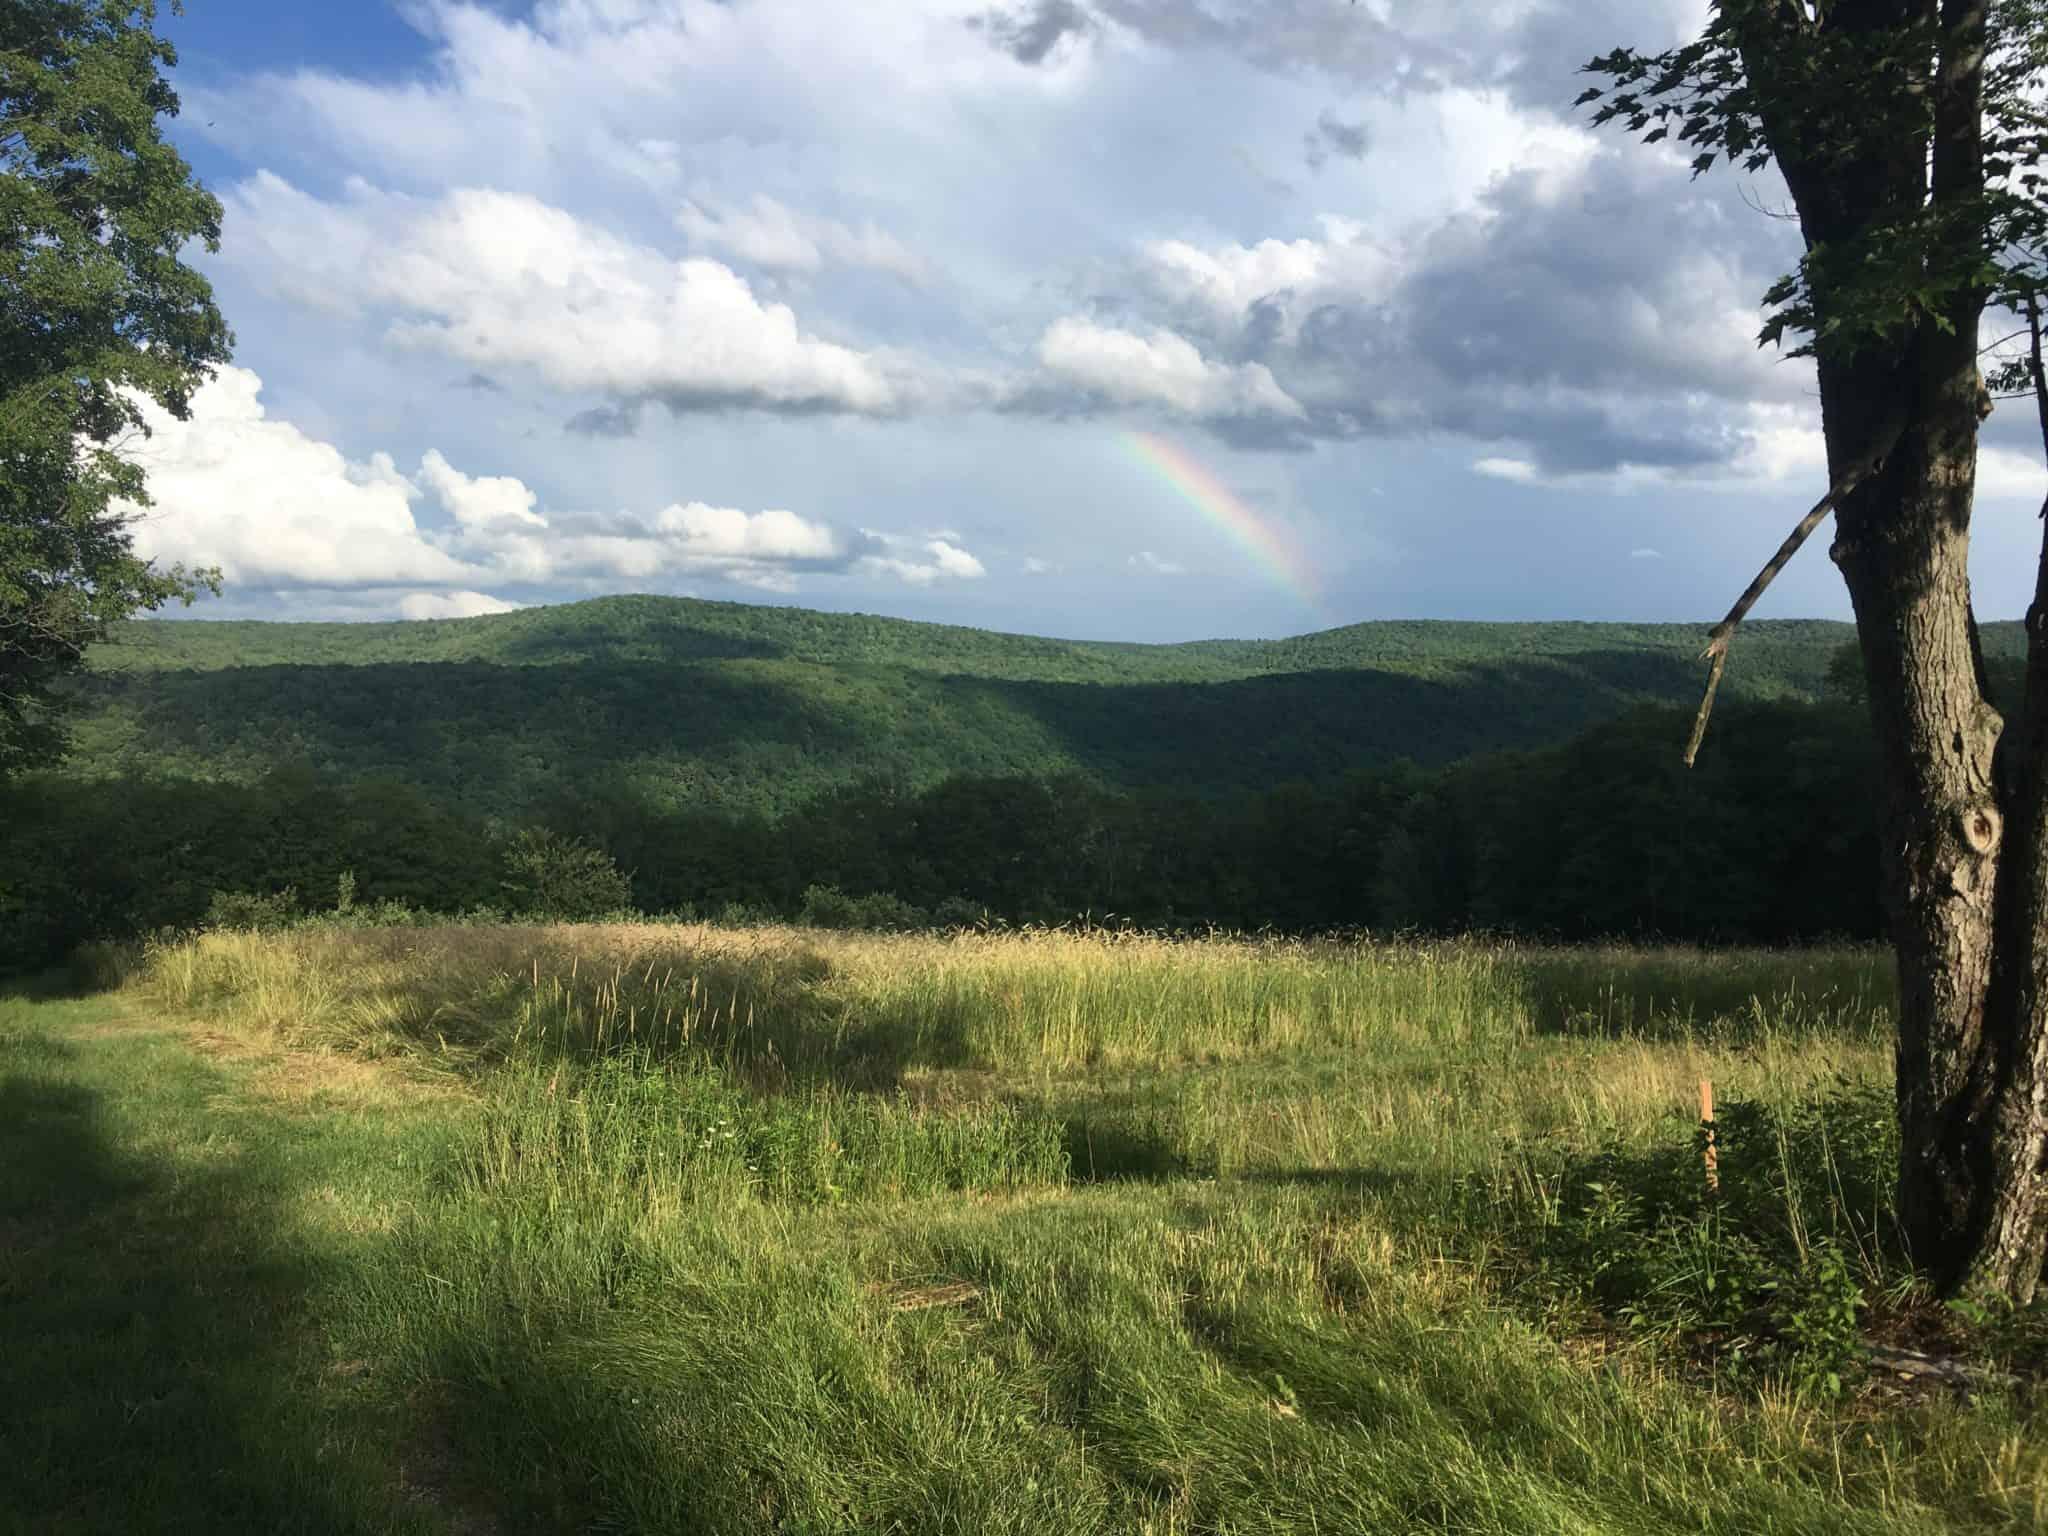 2017 was a season of rainbows.